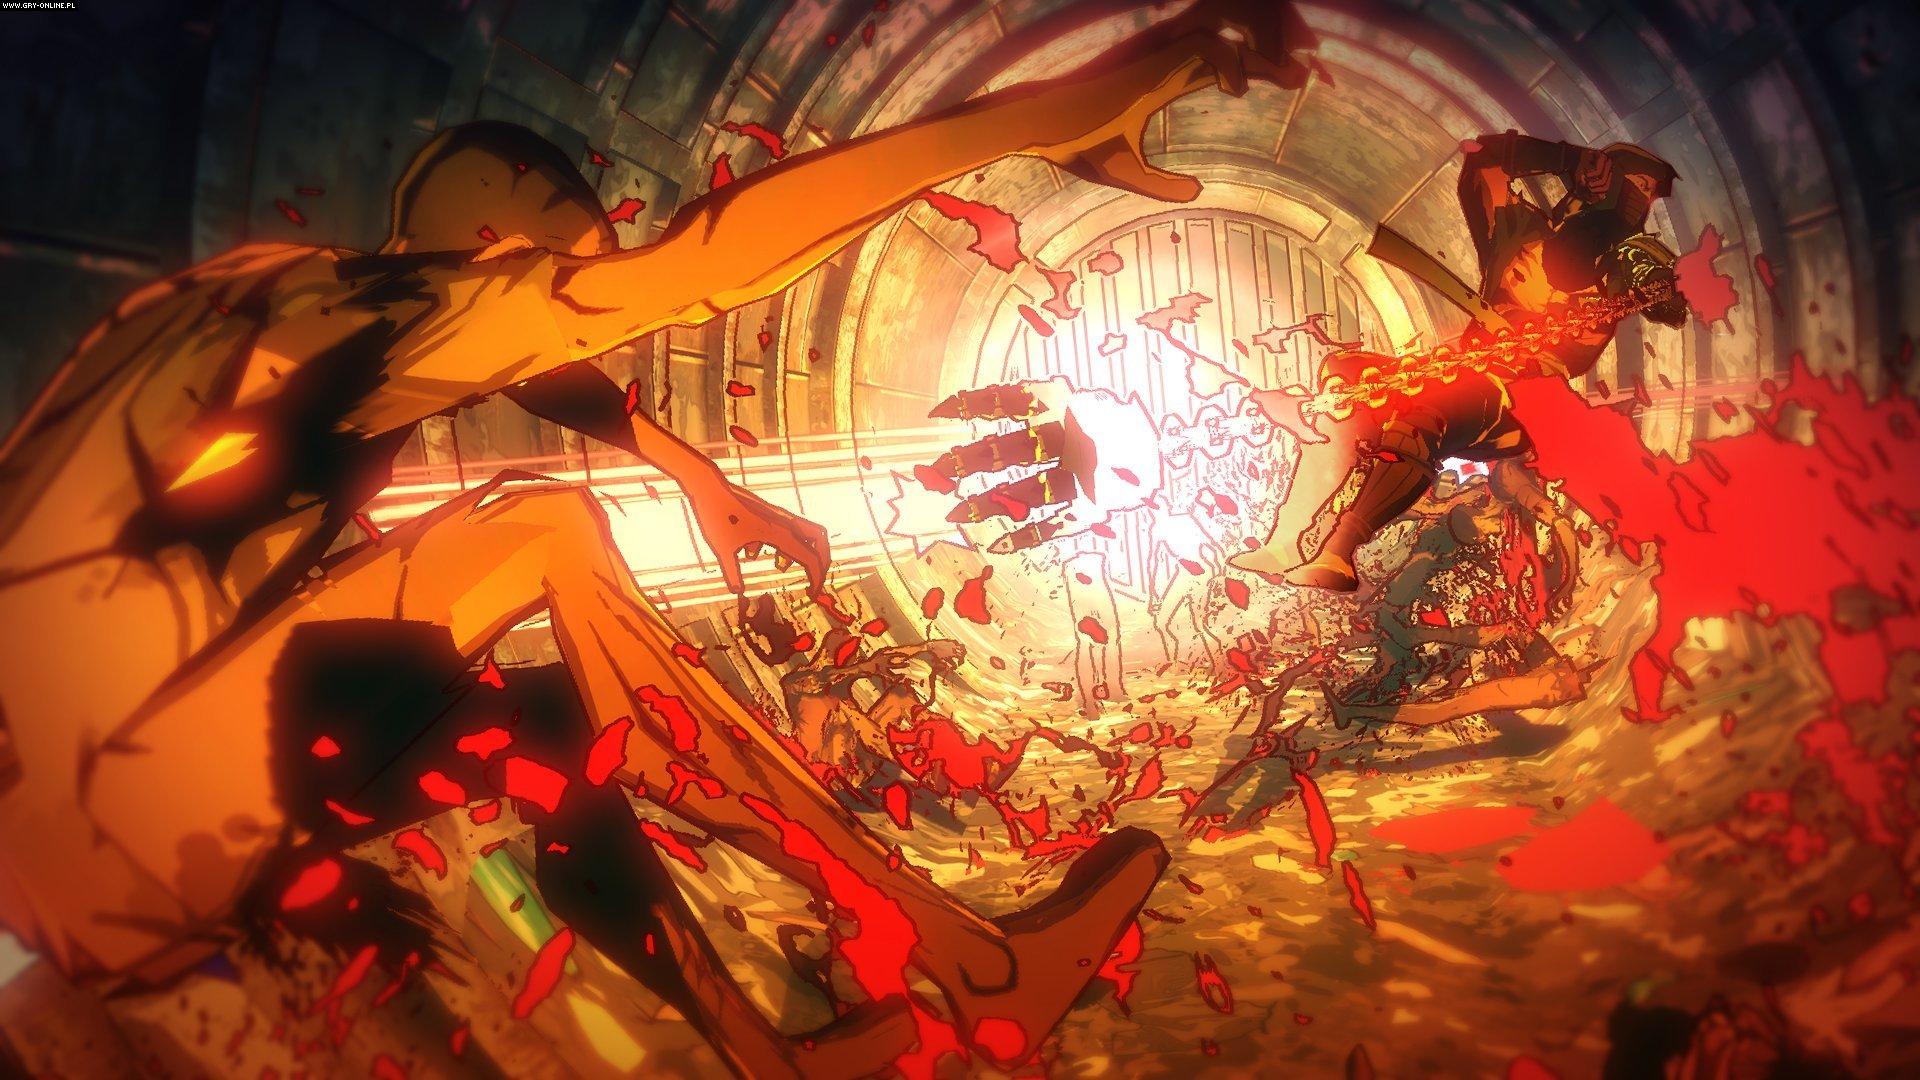 Game Ninja Gaiden Wallpaper: Yaiba: Ninja Gaiden HD Wallpaper